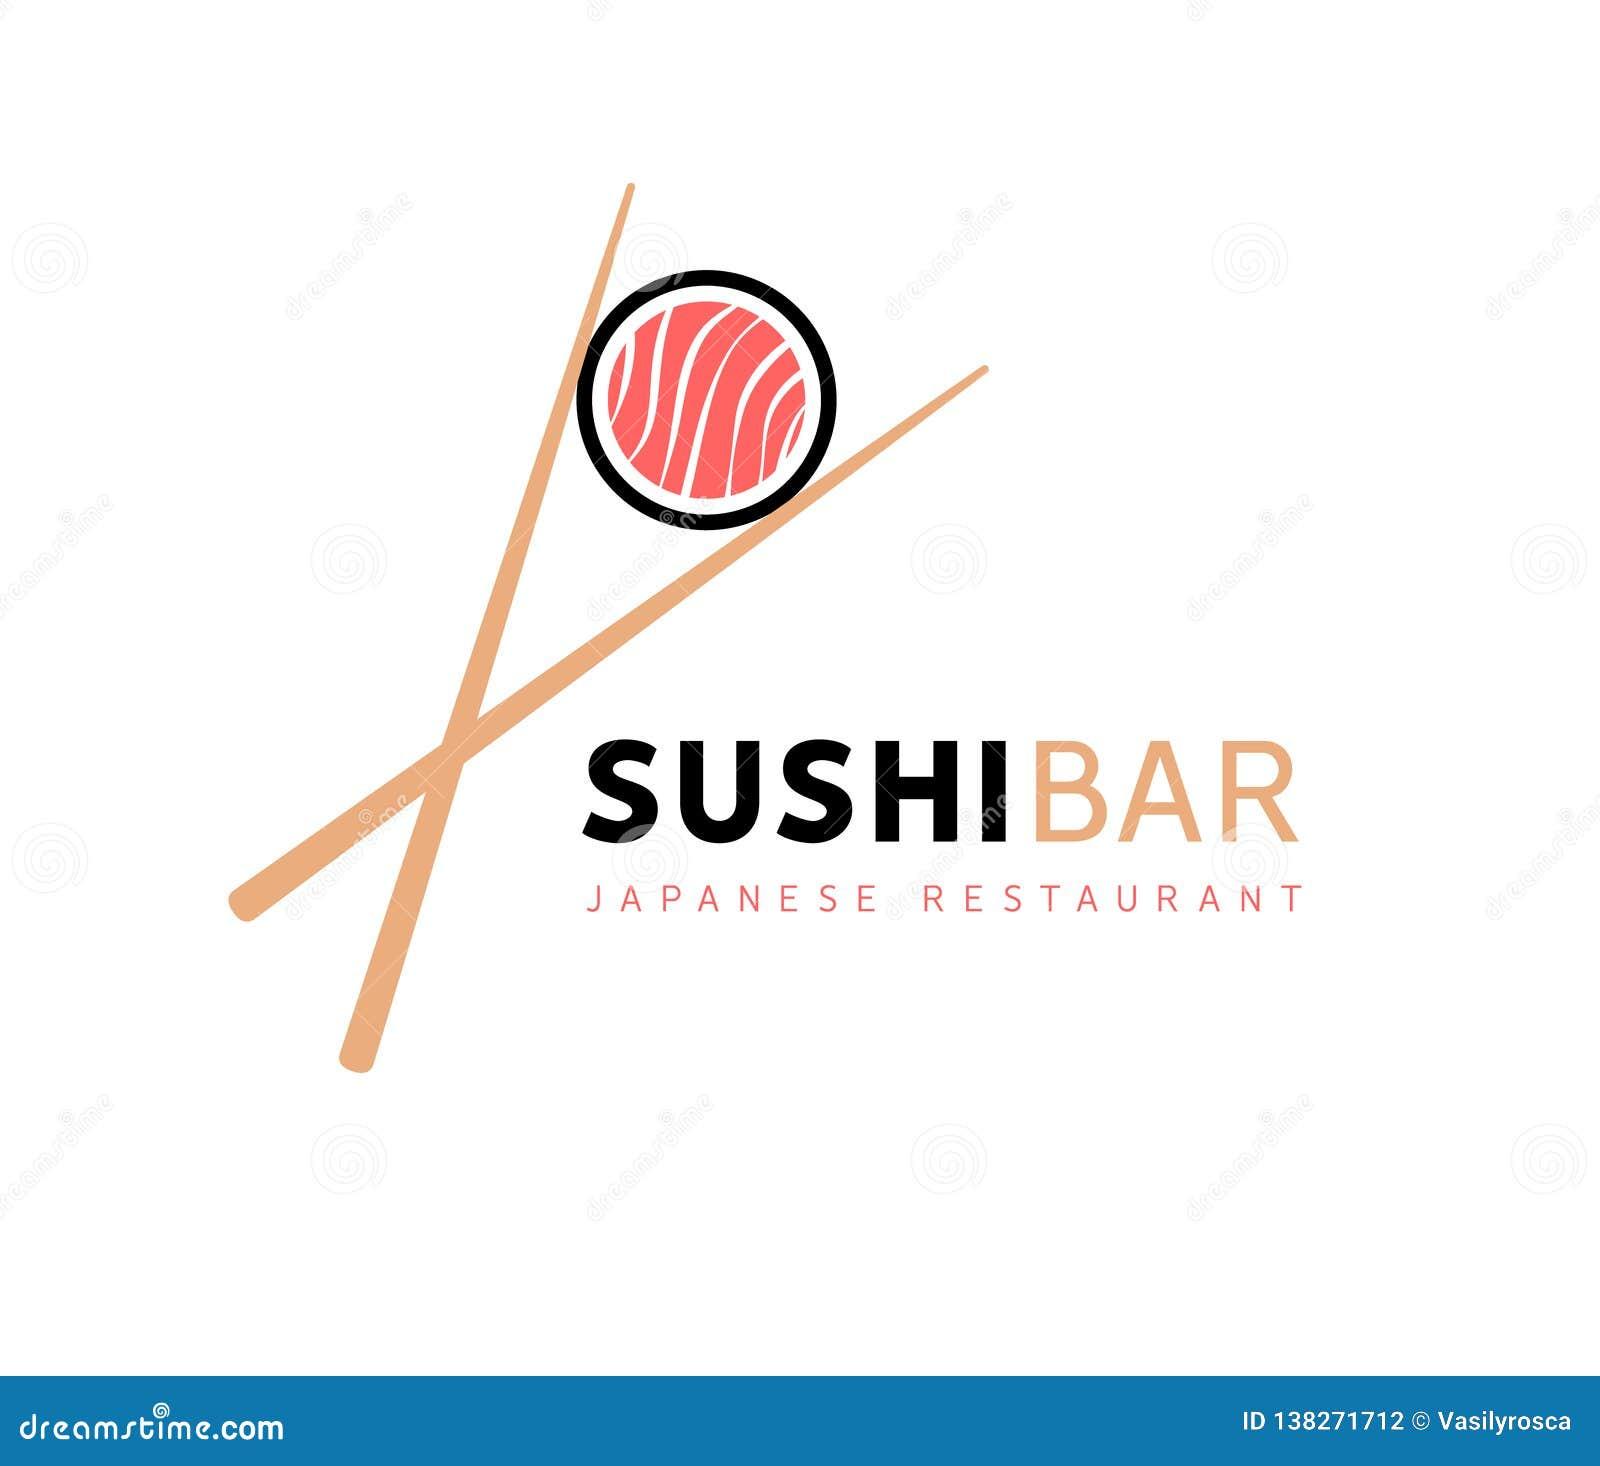 Sushi Logo Fish Food Japan Restaurant Japanese Seafood Logo Asian Dinner Stock Illustration Illustration Of Japan Fish 138271712